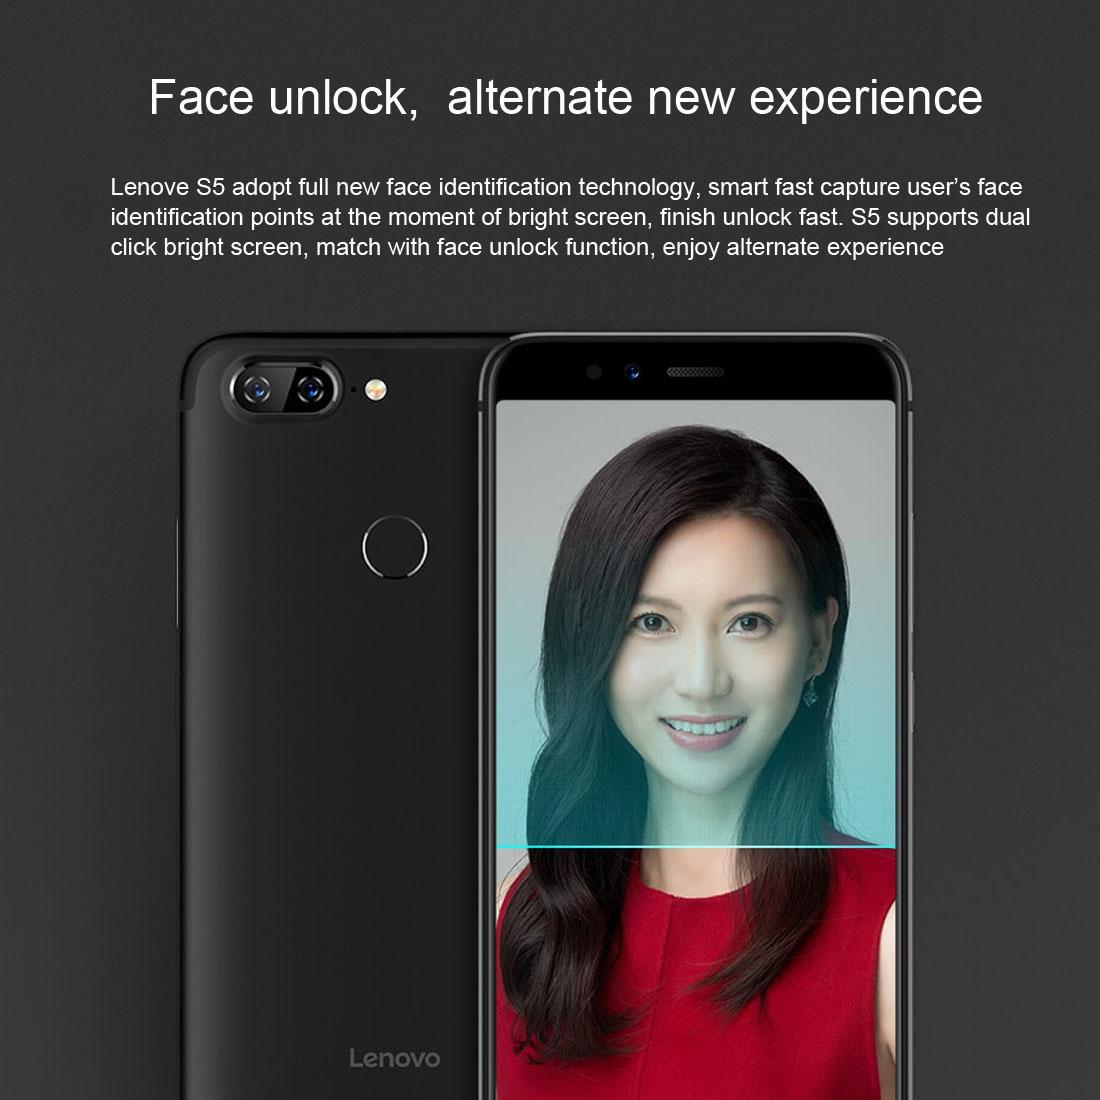 i.ibb.co/m0yQFjG/Smartphone-Celular-3-GB-RAM-32-GB-ROM-Lenovo-S5-K520-10.jpg